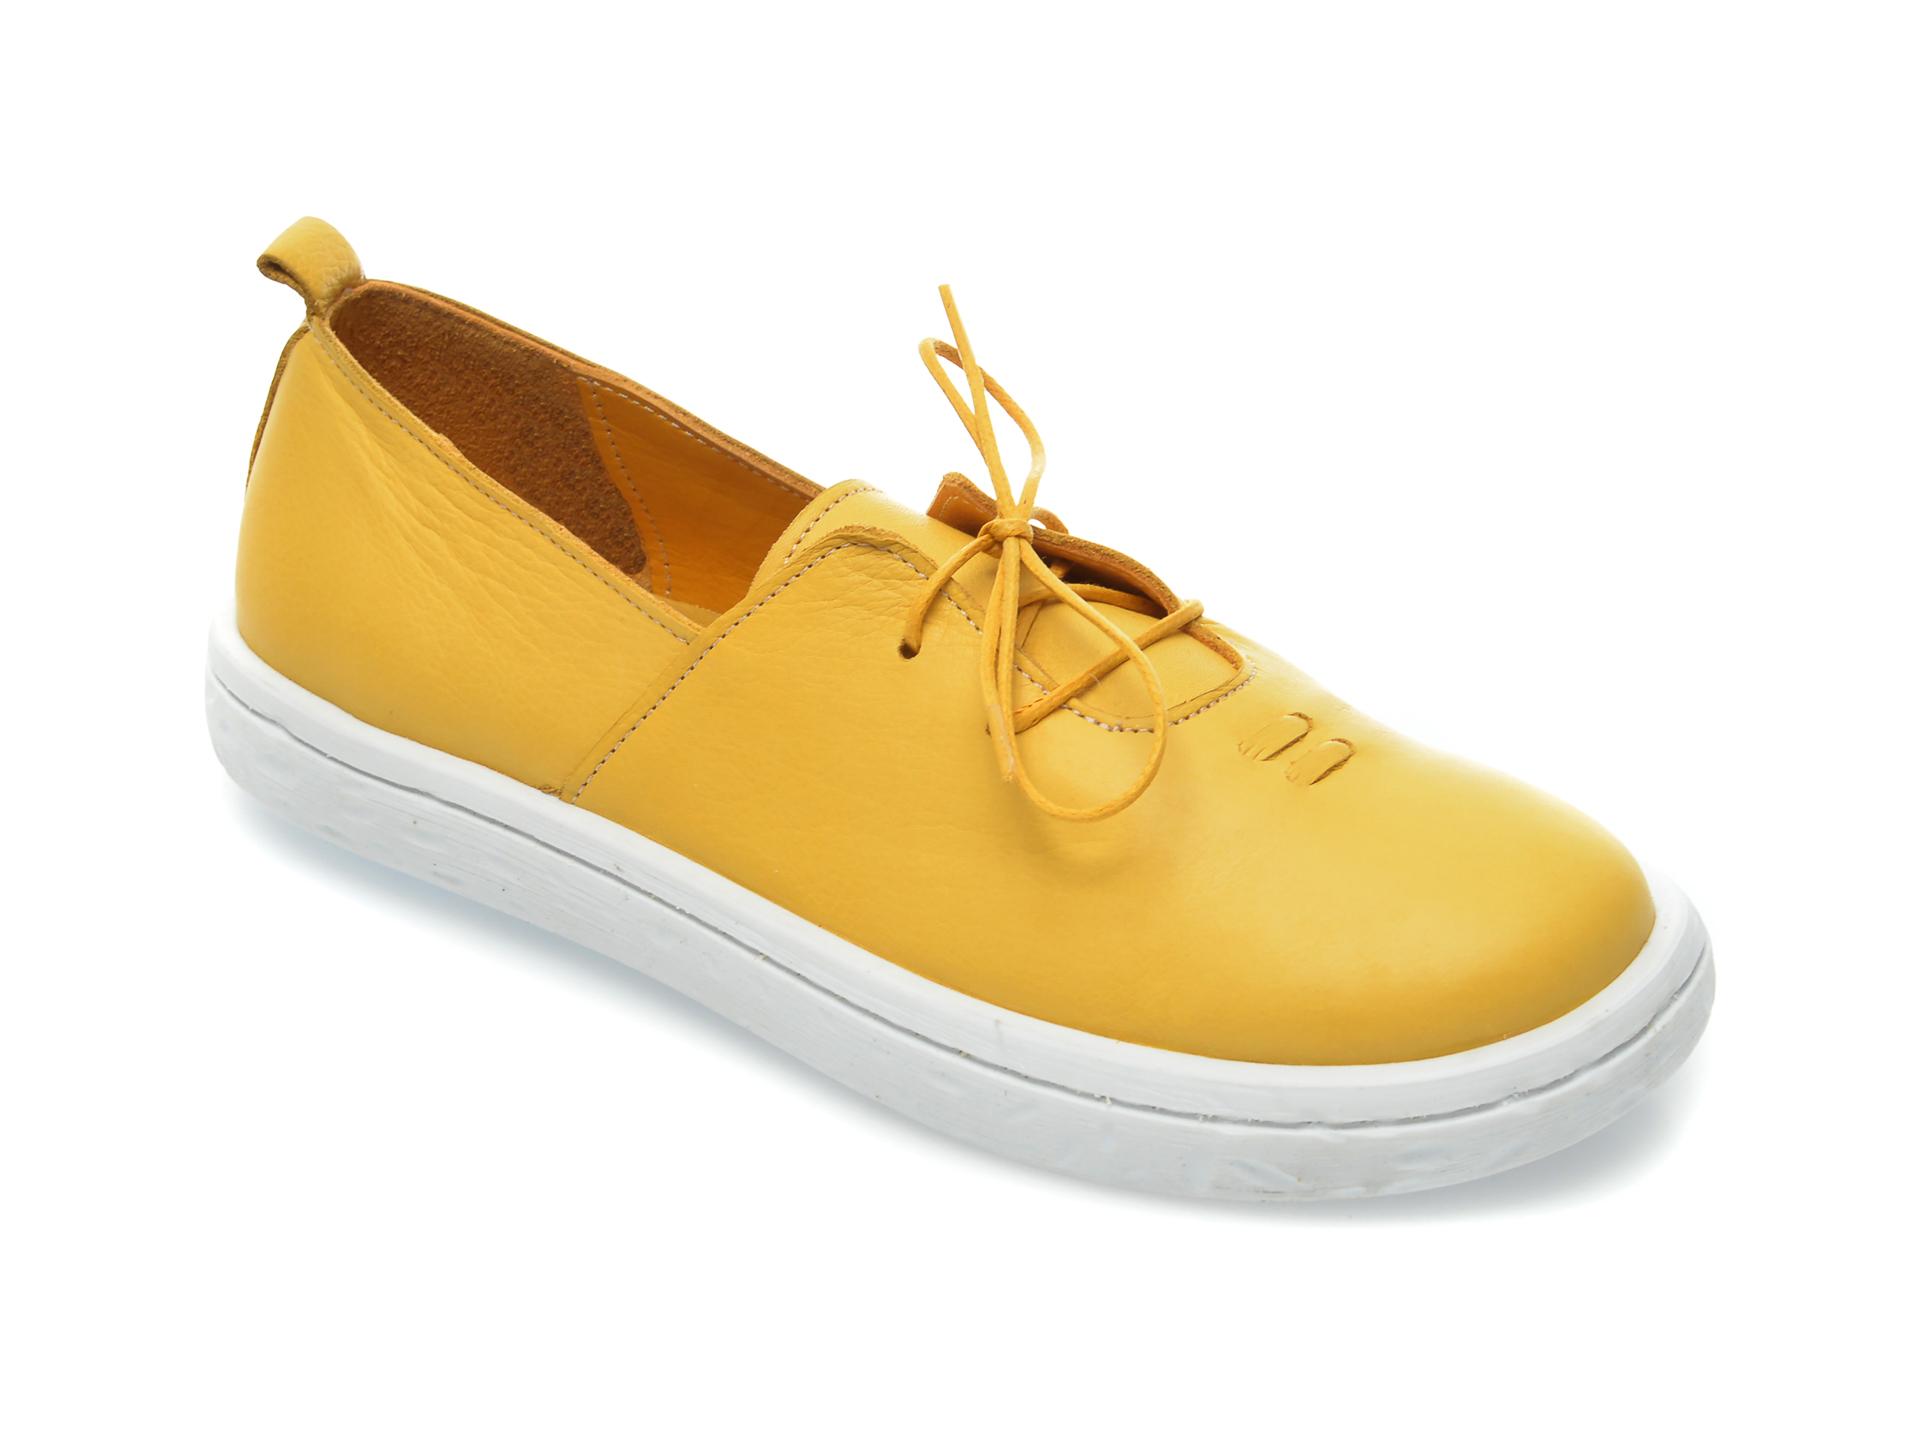 Pantofi Flavia Passini Galbeni, 101, Din Piele Naturala